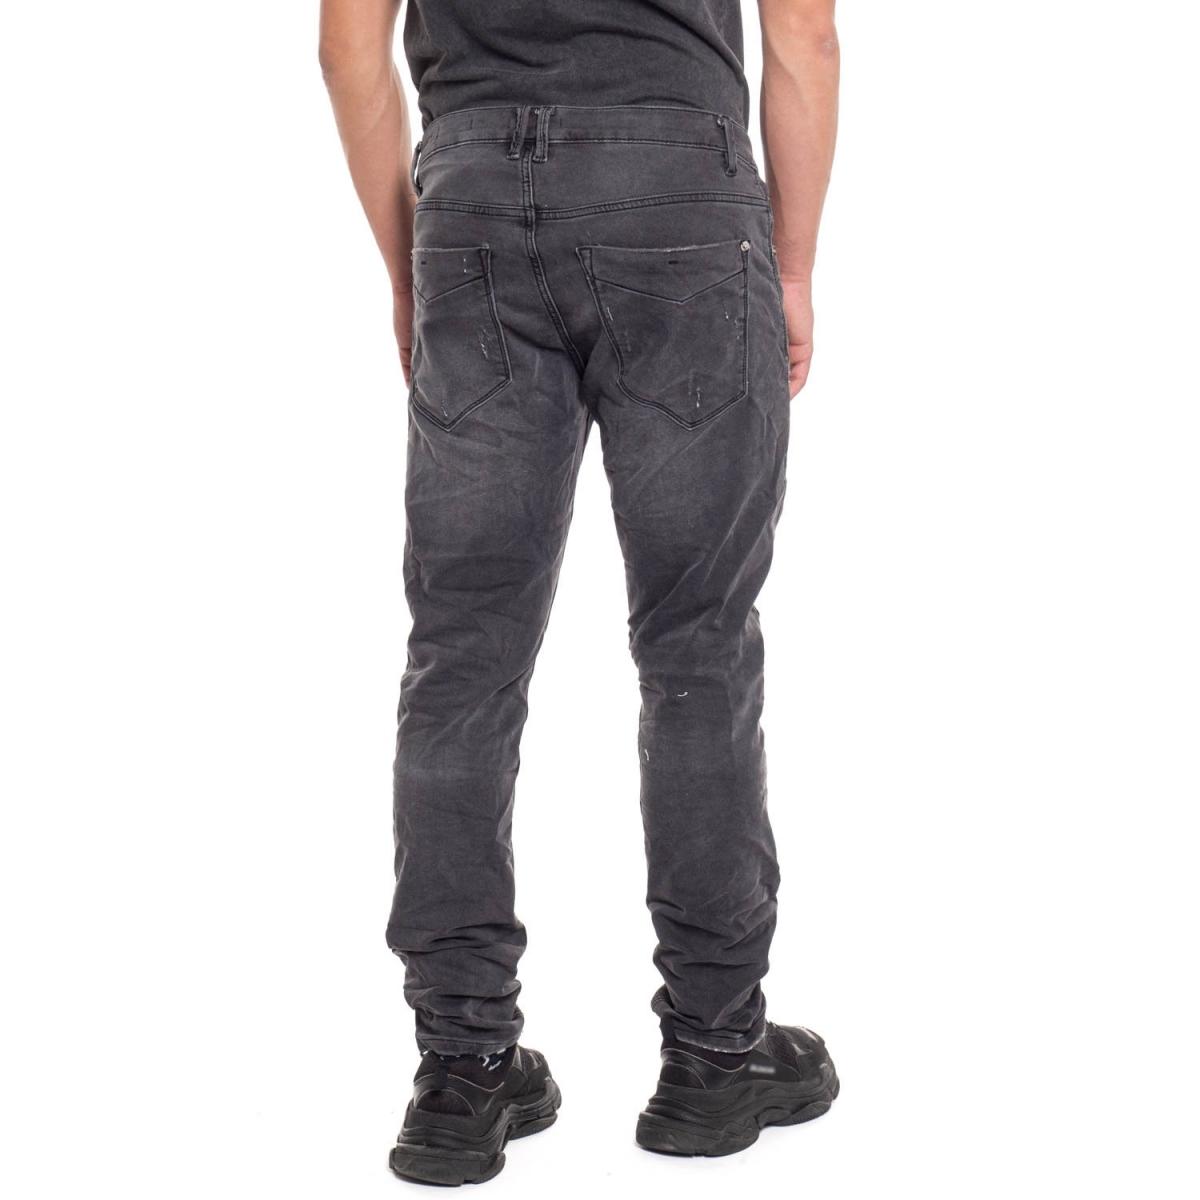 clothing Denim men Jeans LPC508 LANDEK PARK Cafedelmar Shop